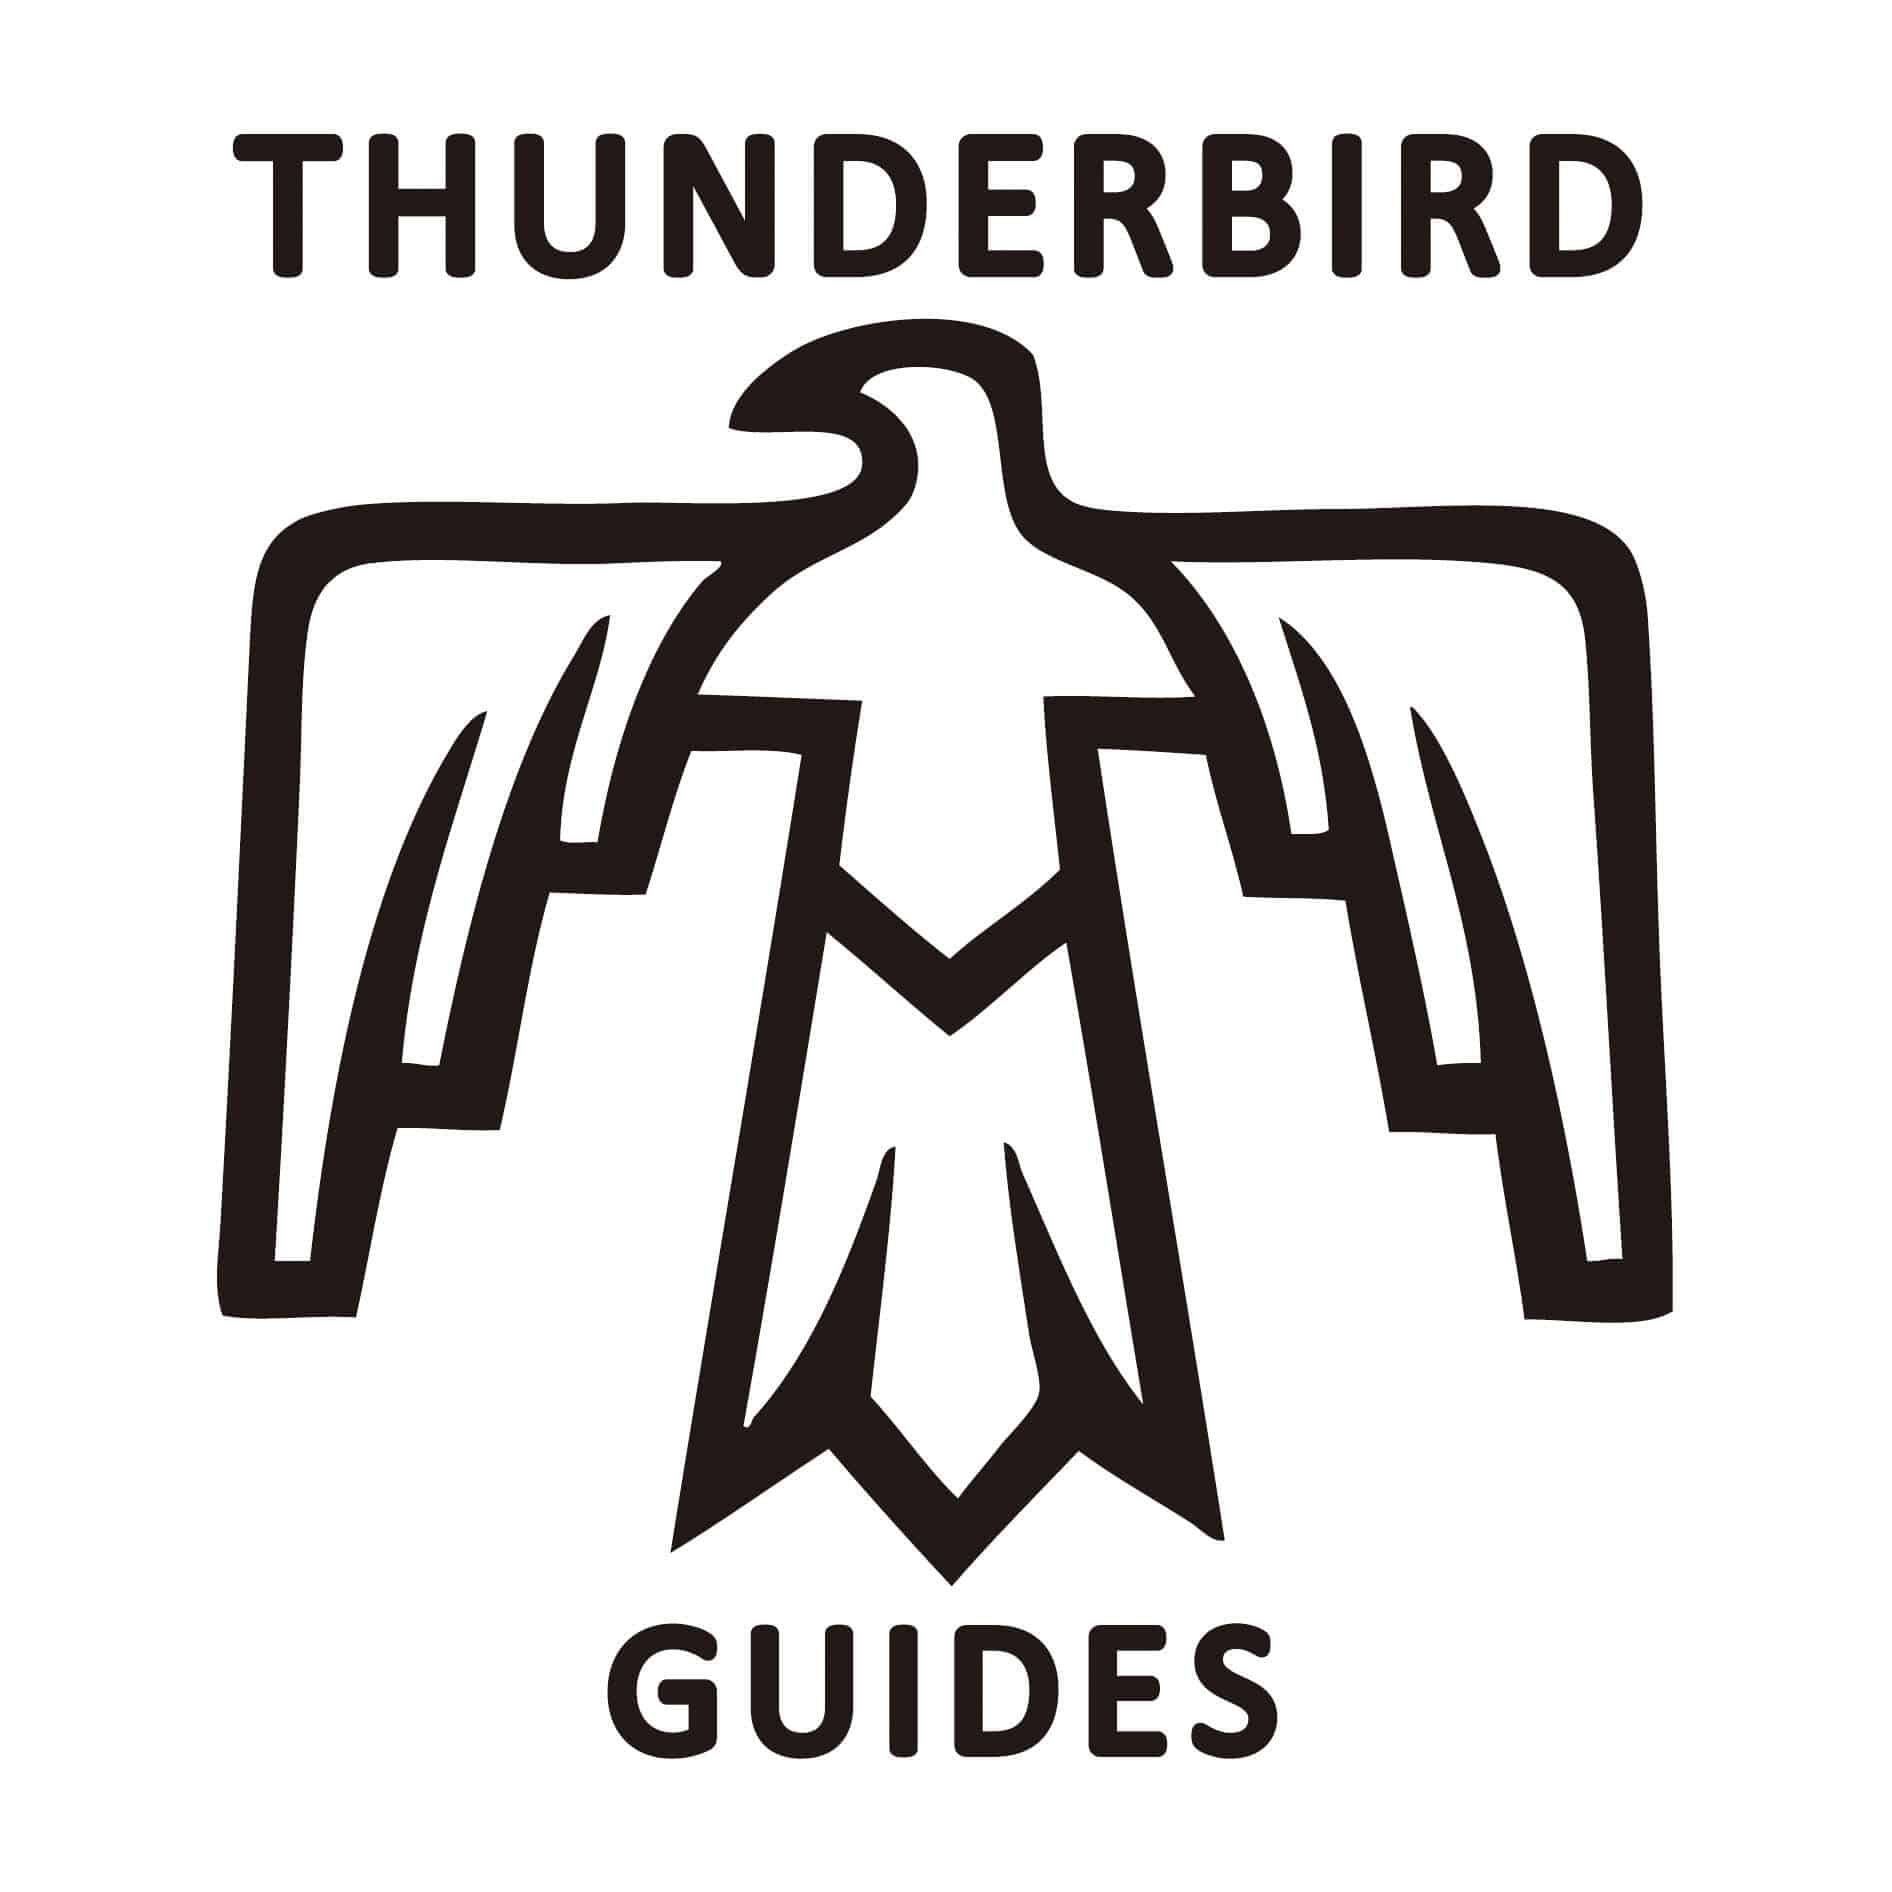 Thunderbird Guides